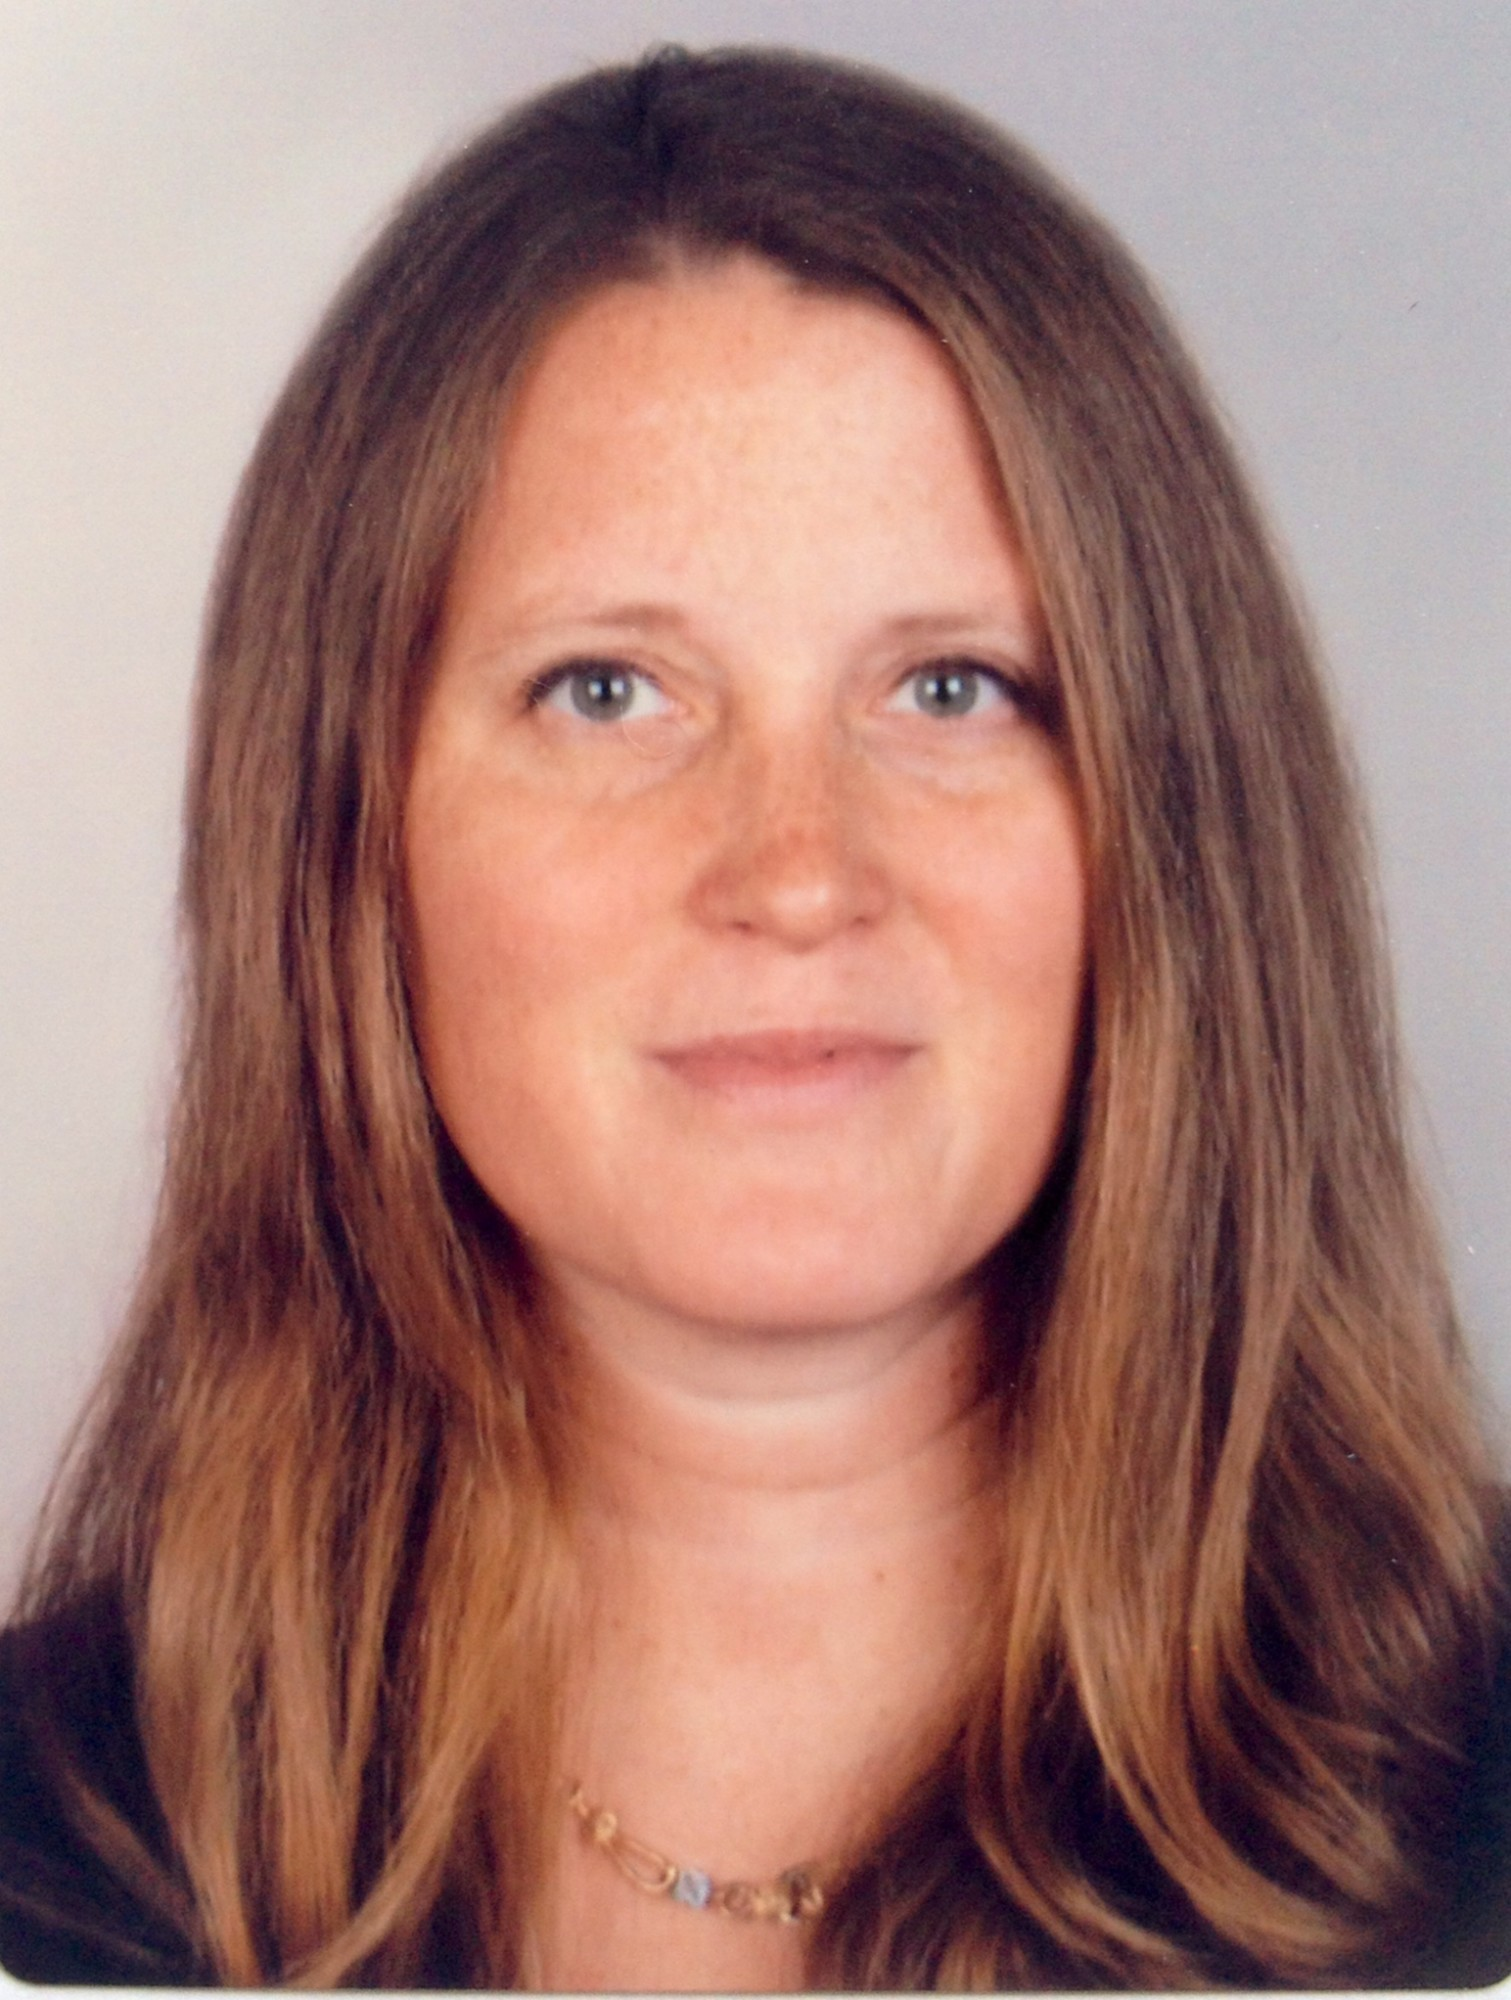 Ruth Beckervordersandforth